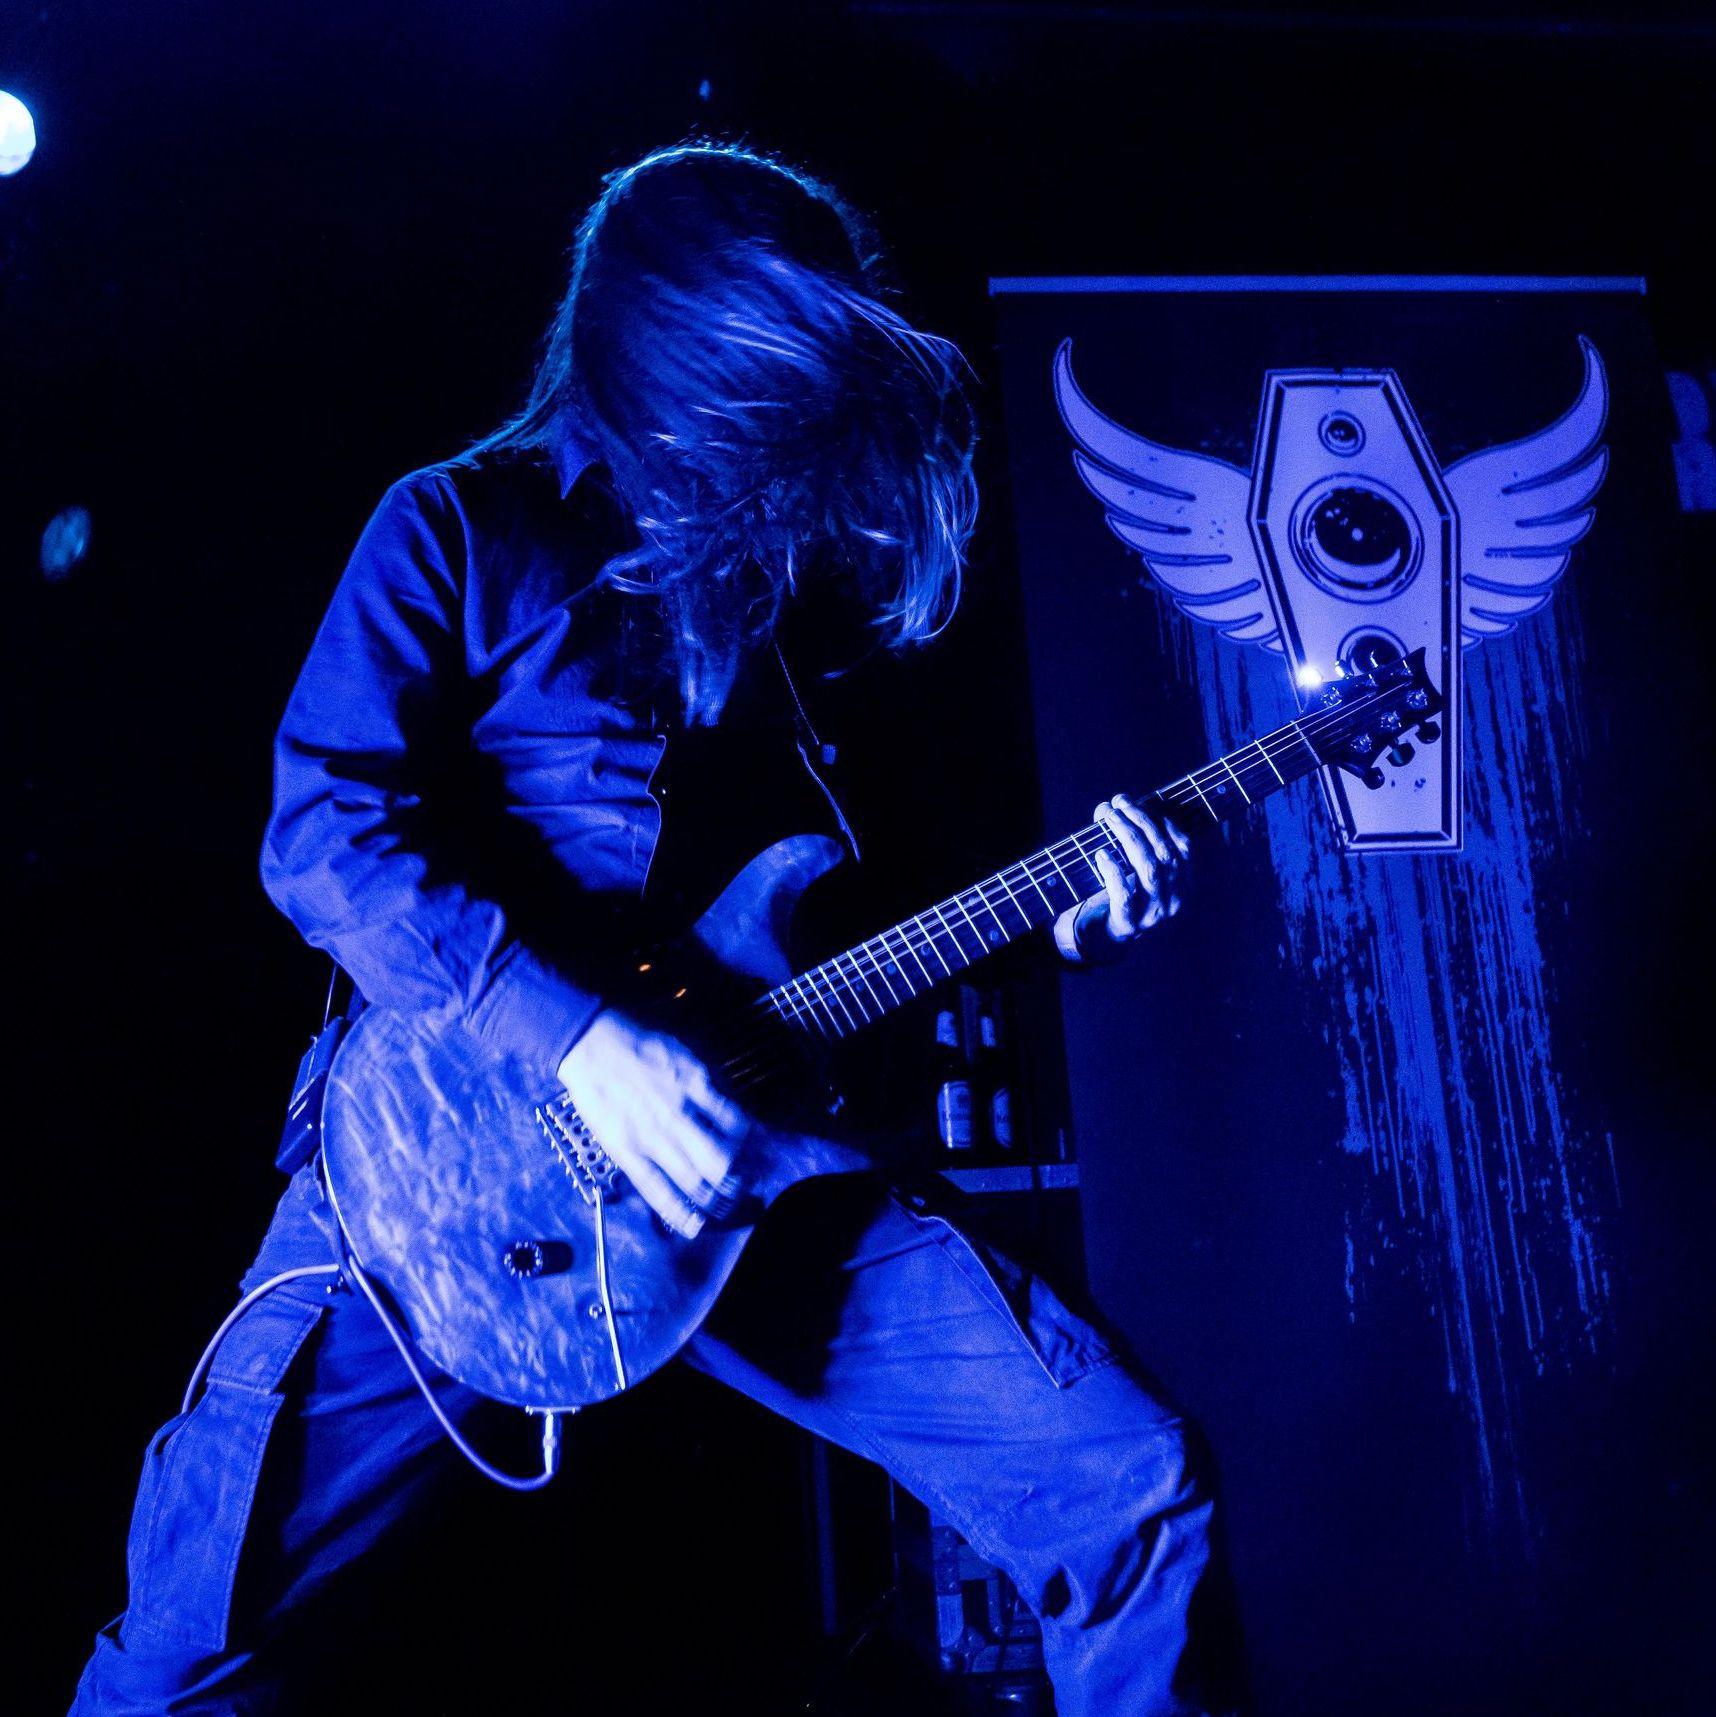 the-very-end-live-zeche-carl-essen-germany-thrash-metal_12